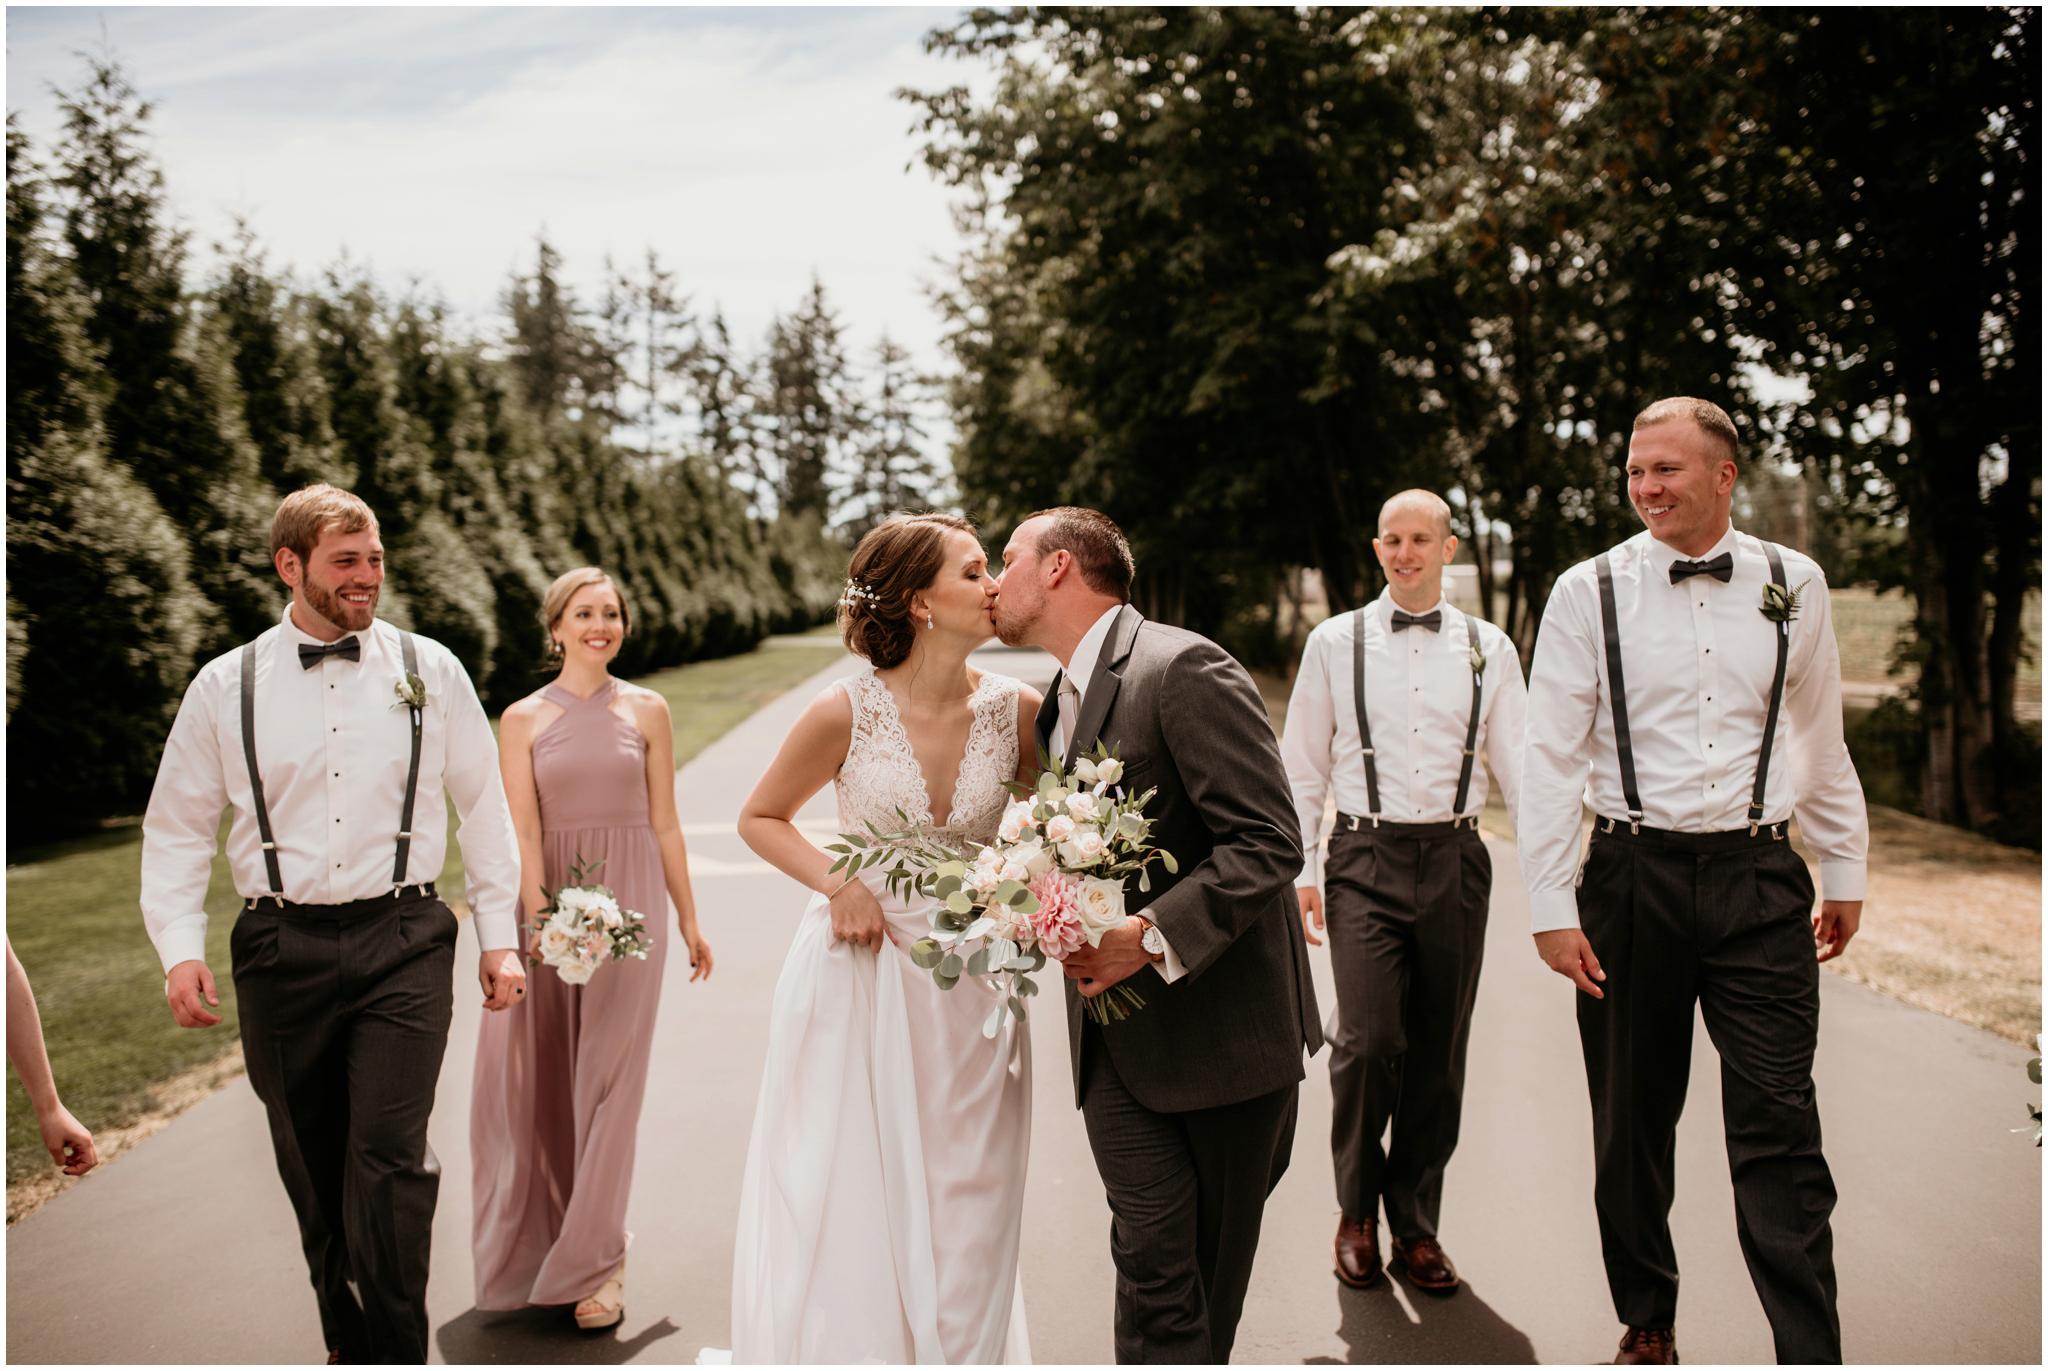 erin-and-tyler-evergreen-gardens-bellingham-wedding-photographer-047.jpg